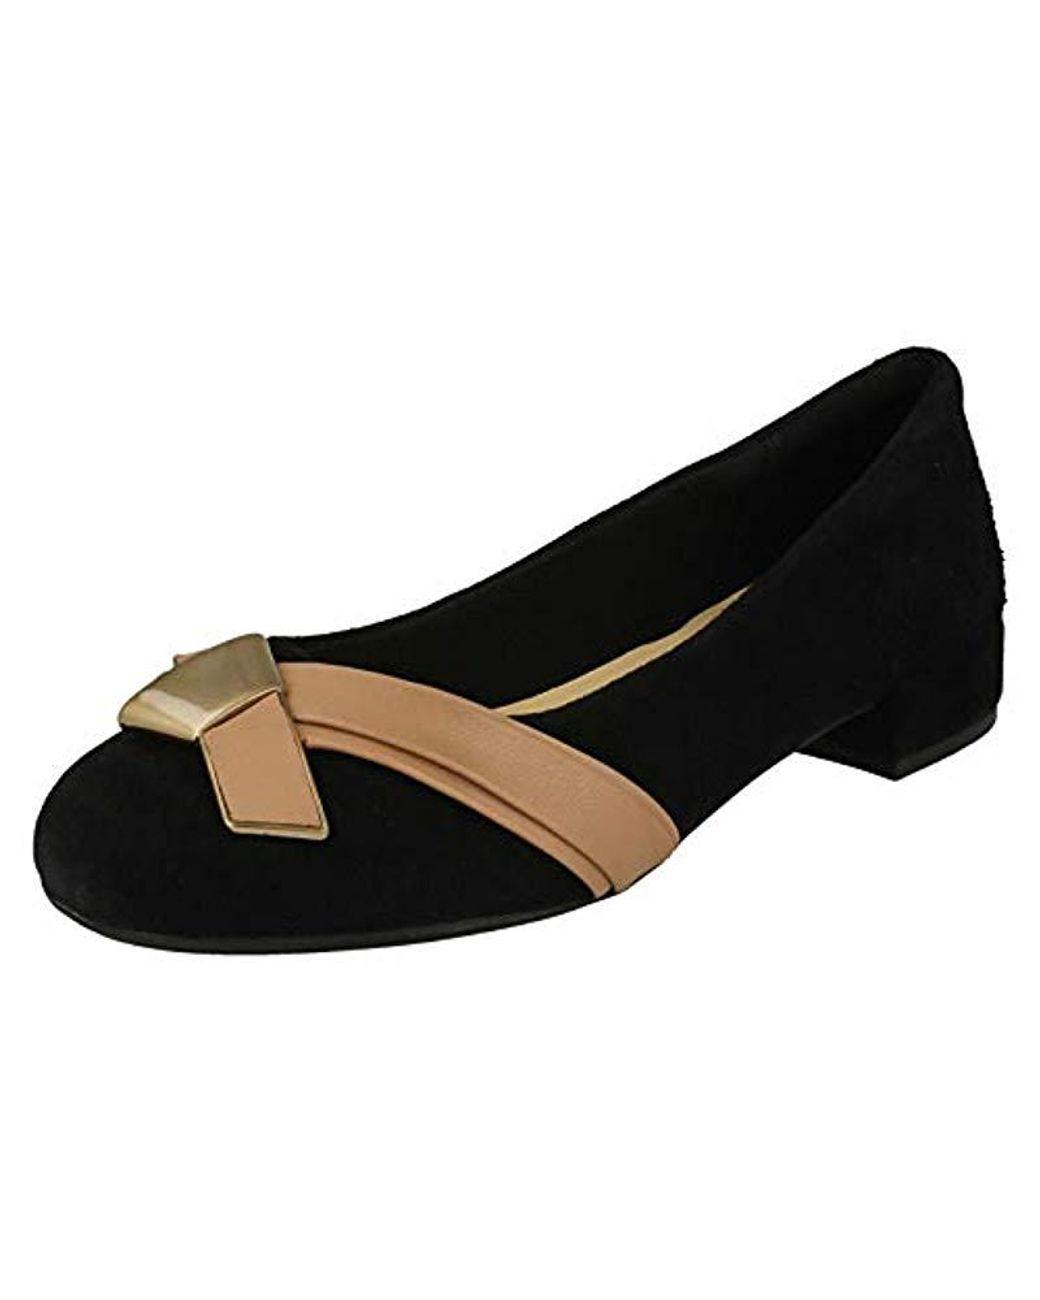 Ladies Clarks Smart Cross Detail Shoes /'Rosabella Moon/'